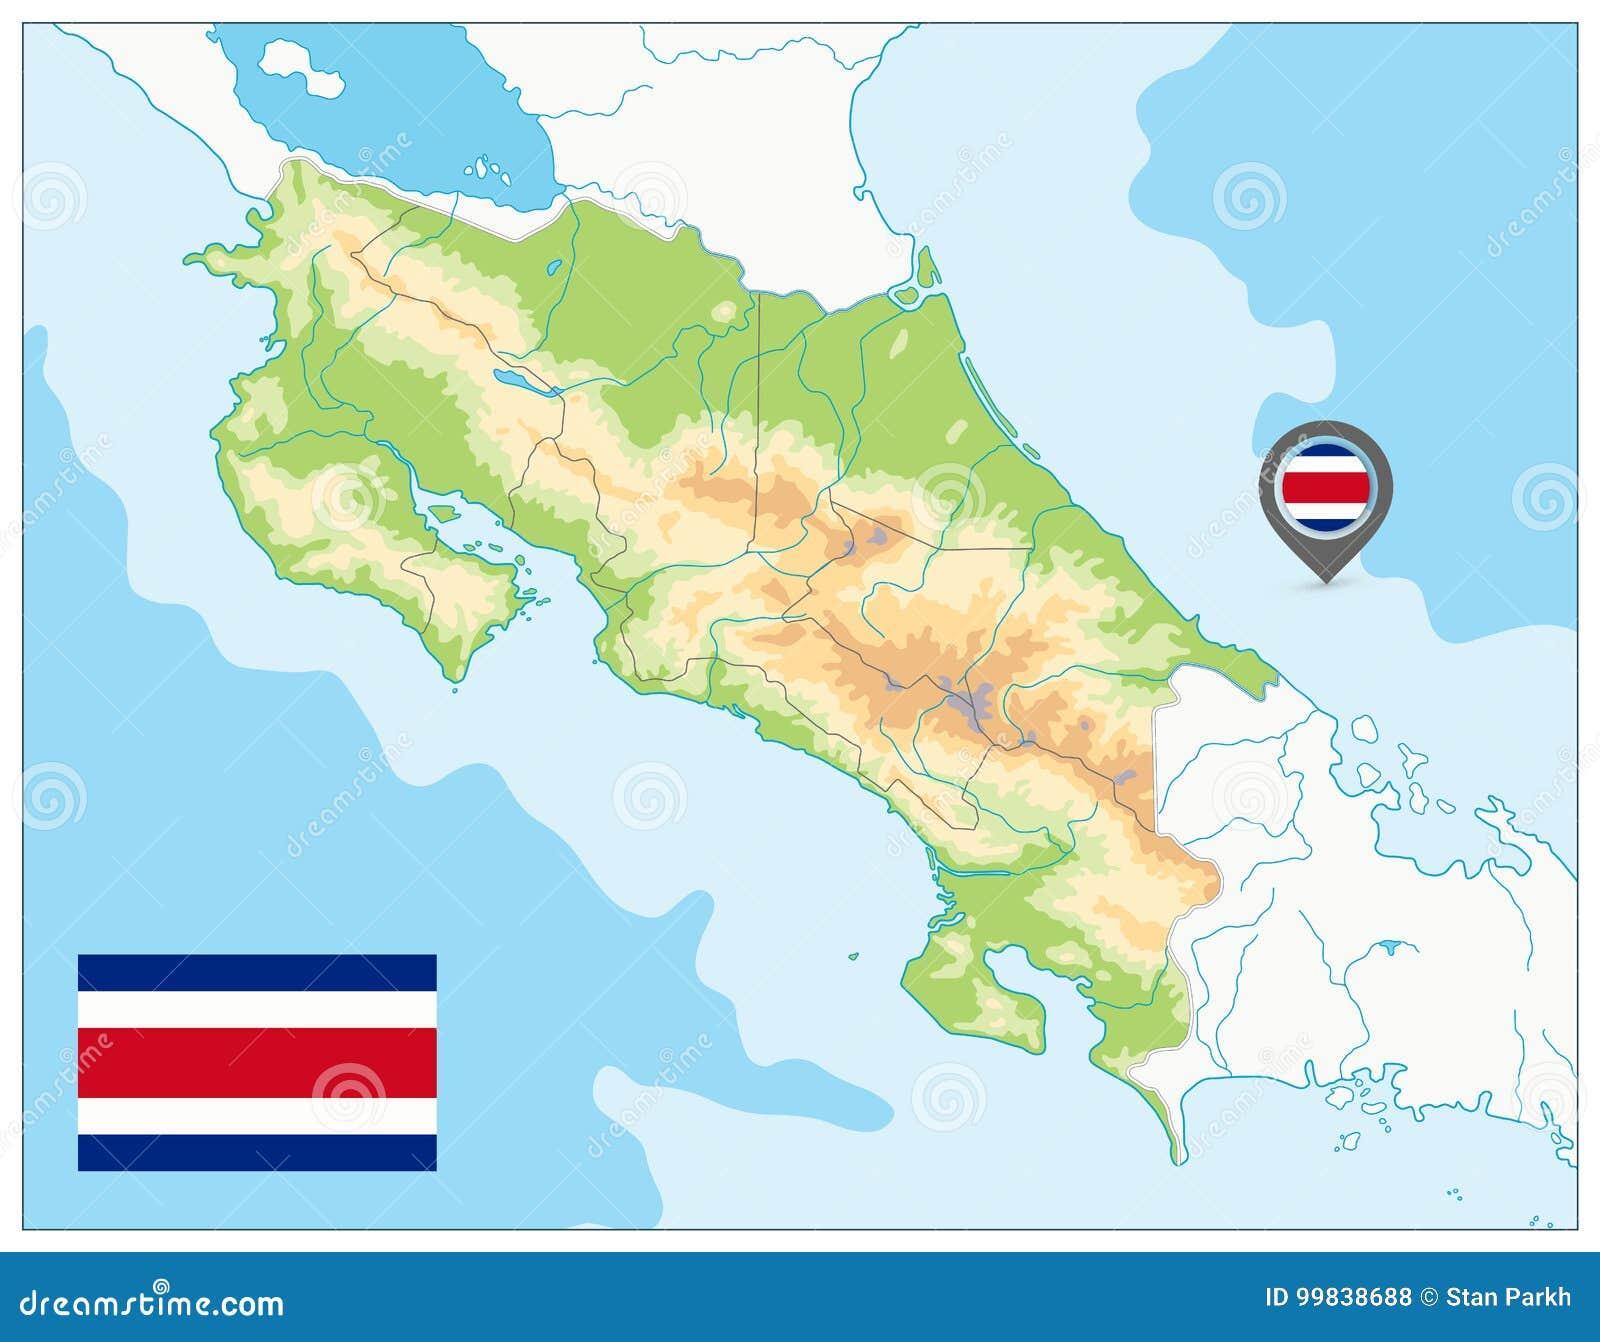 Costa Rica Physical Map NENHUM texto